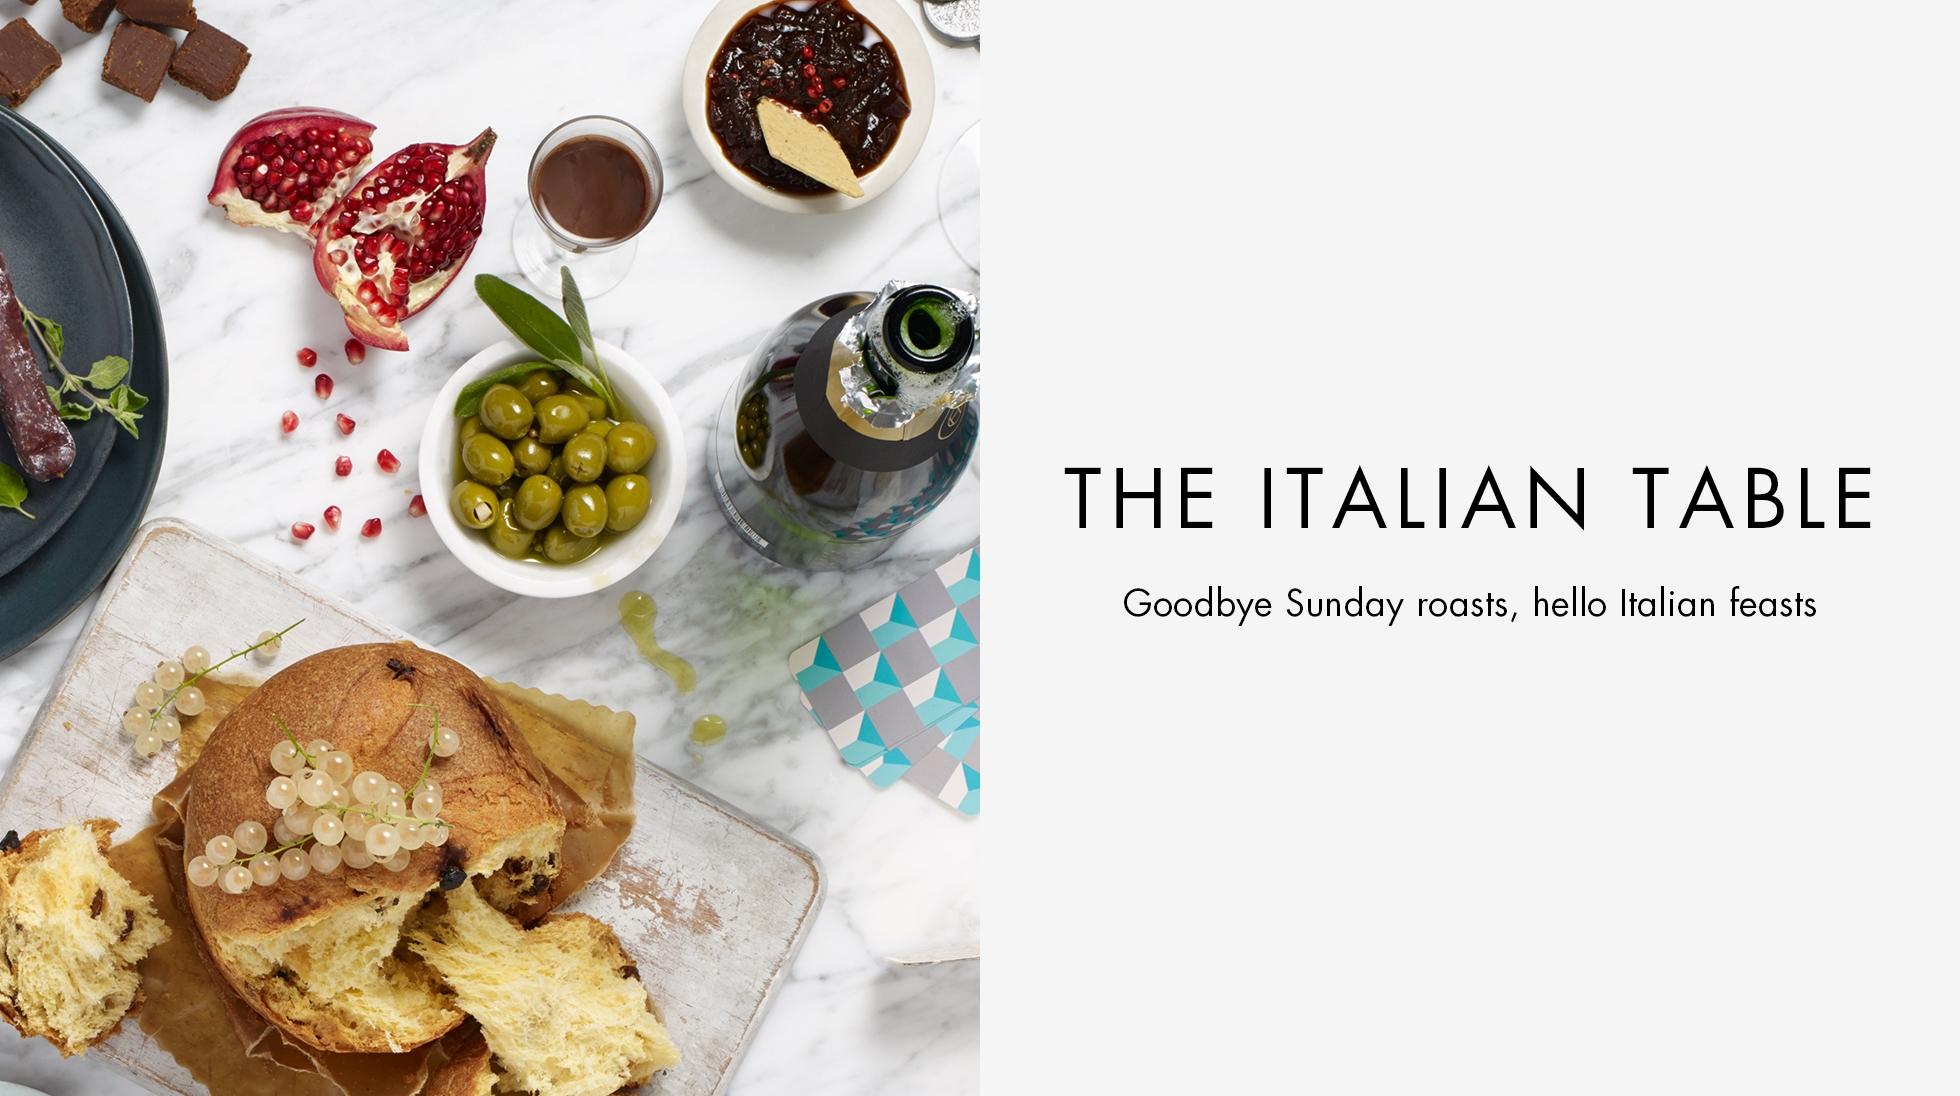 Designer Fashion, Beauty, Food & Wine